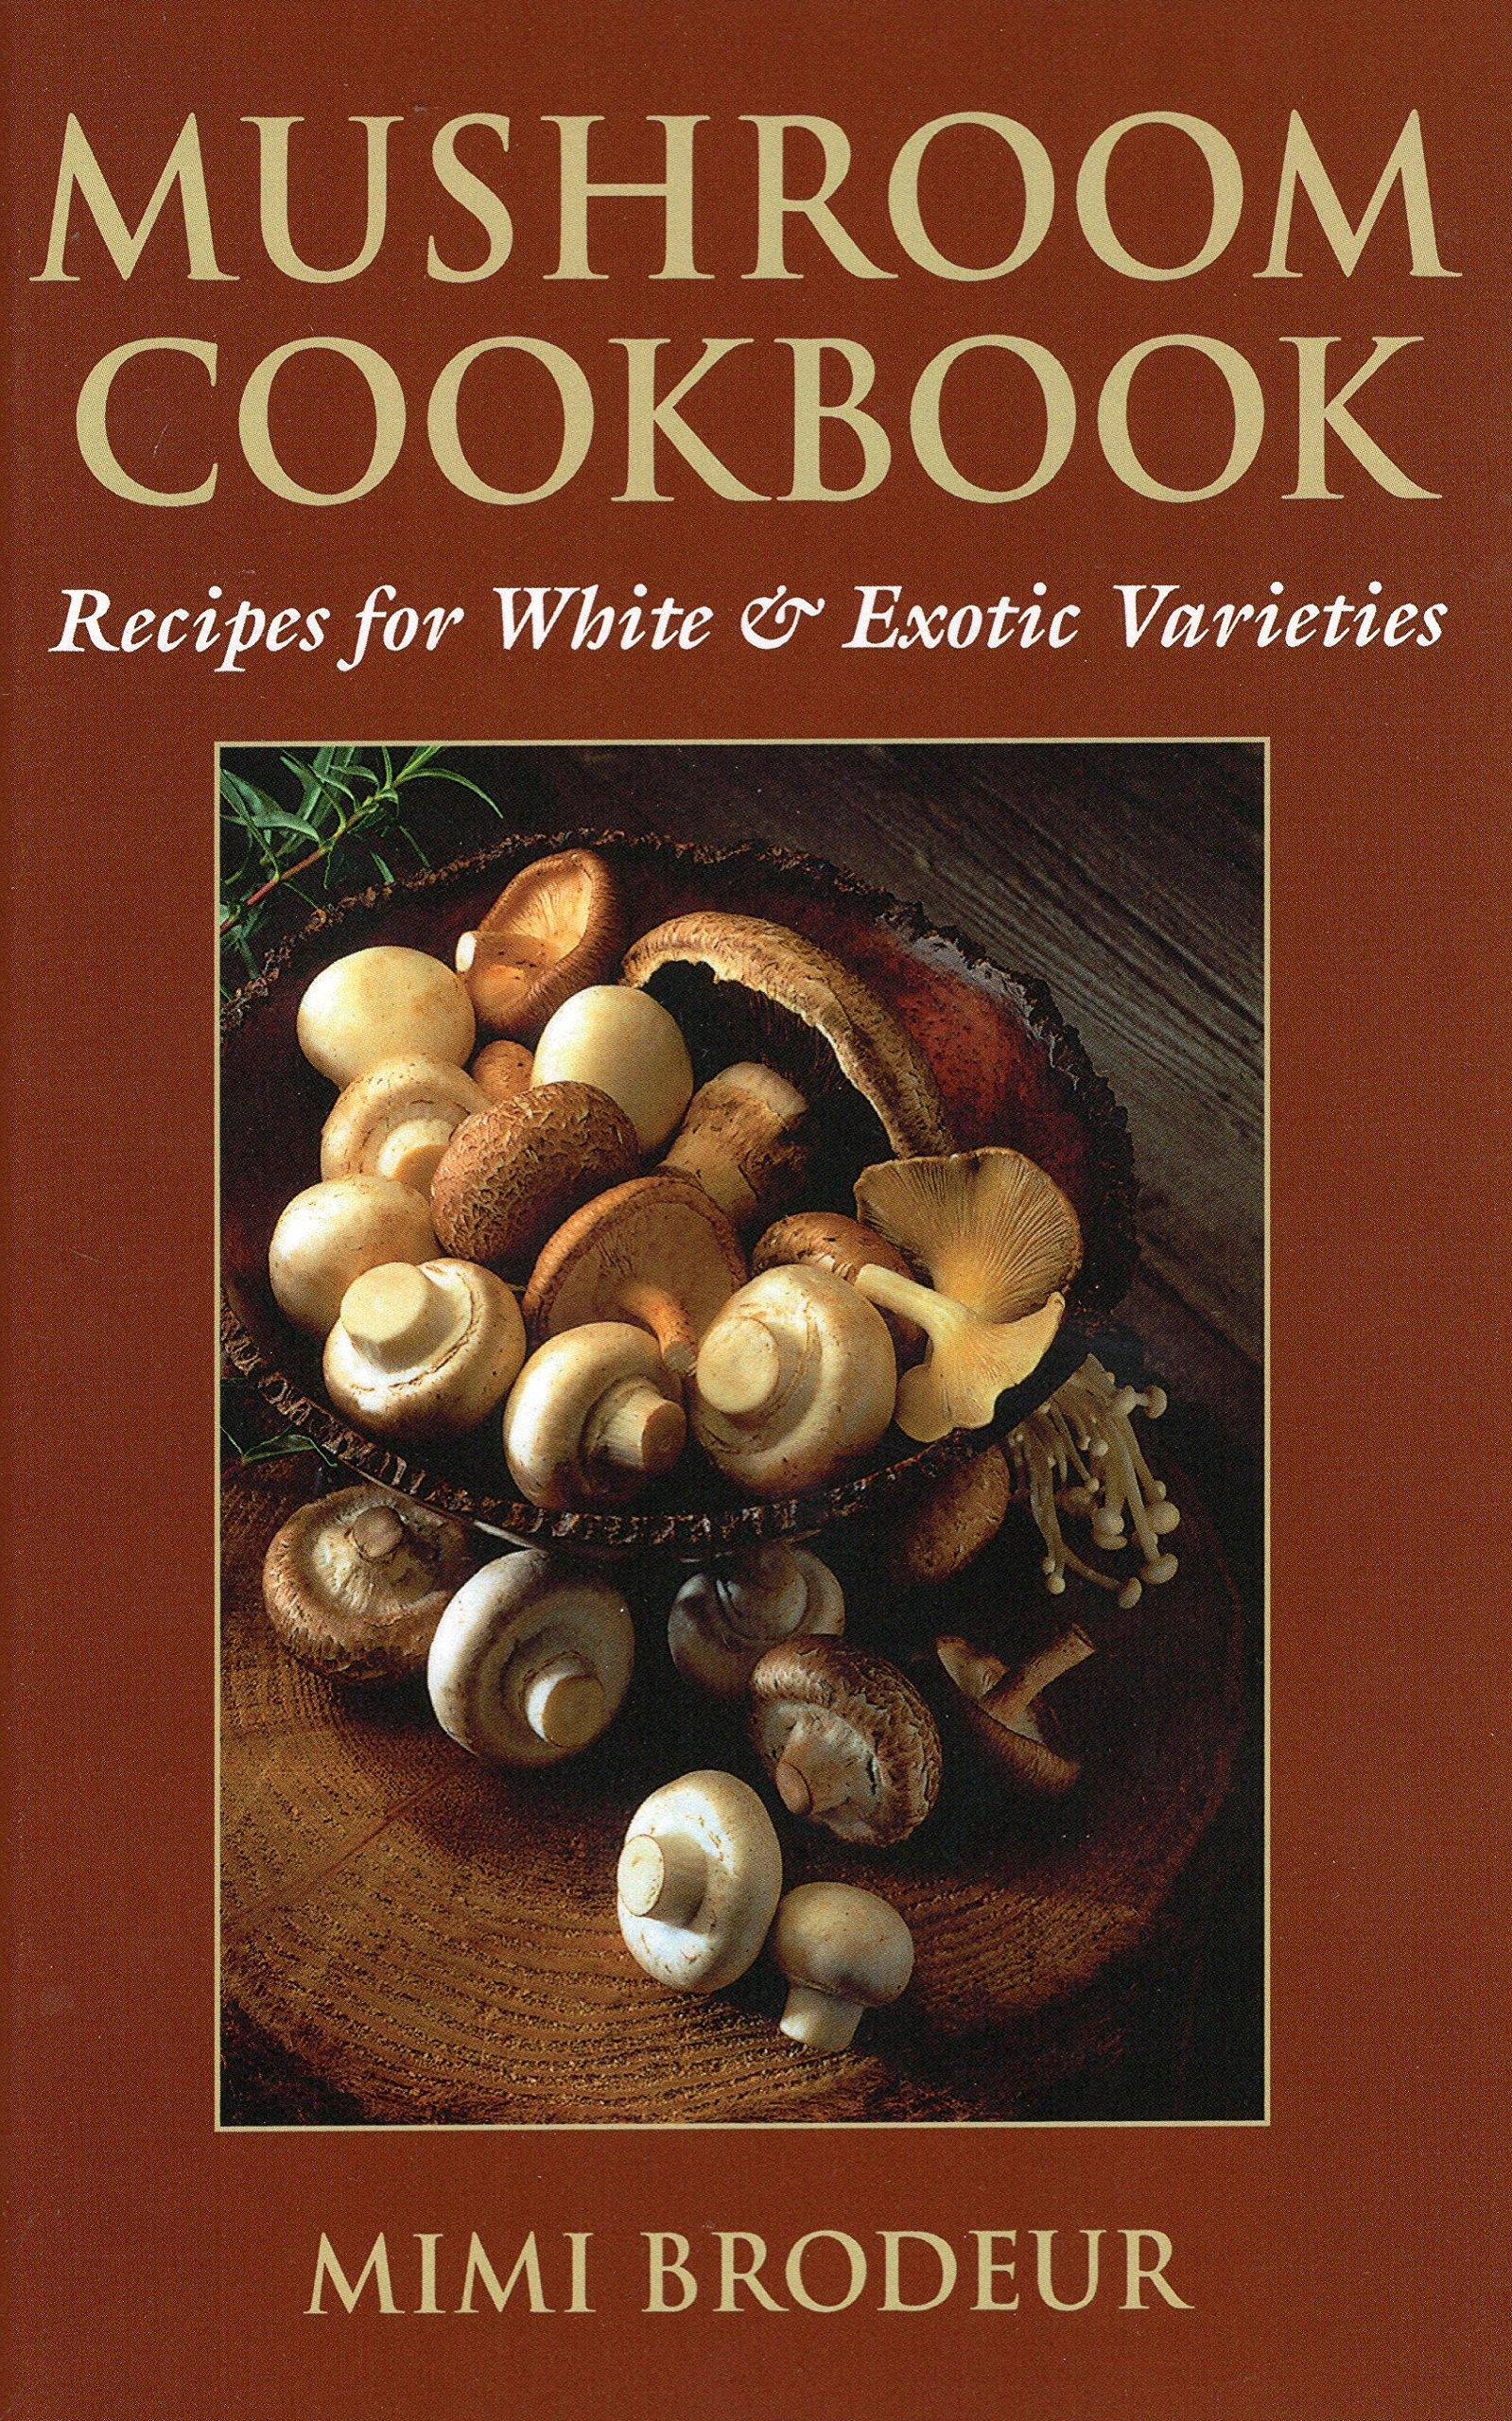 Download Mushroom Cookbook: Recipes for White & Exotic Varieties ebook